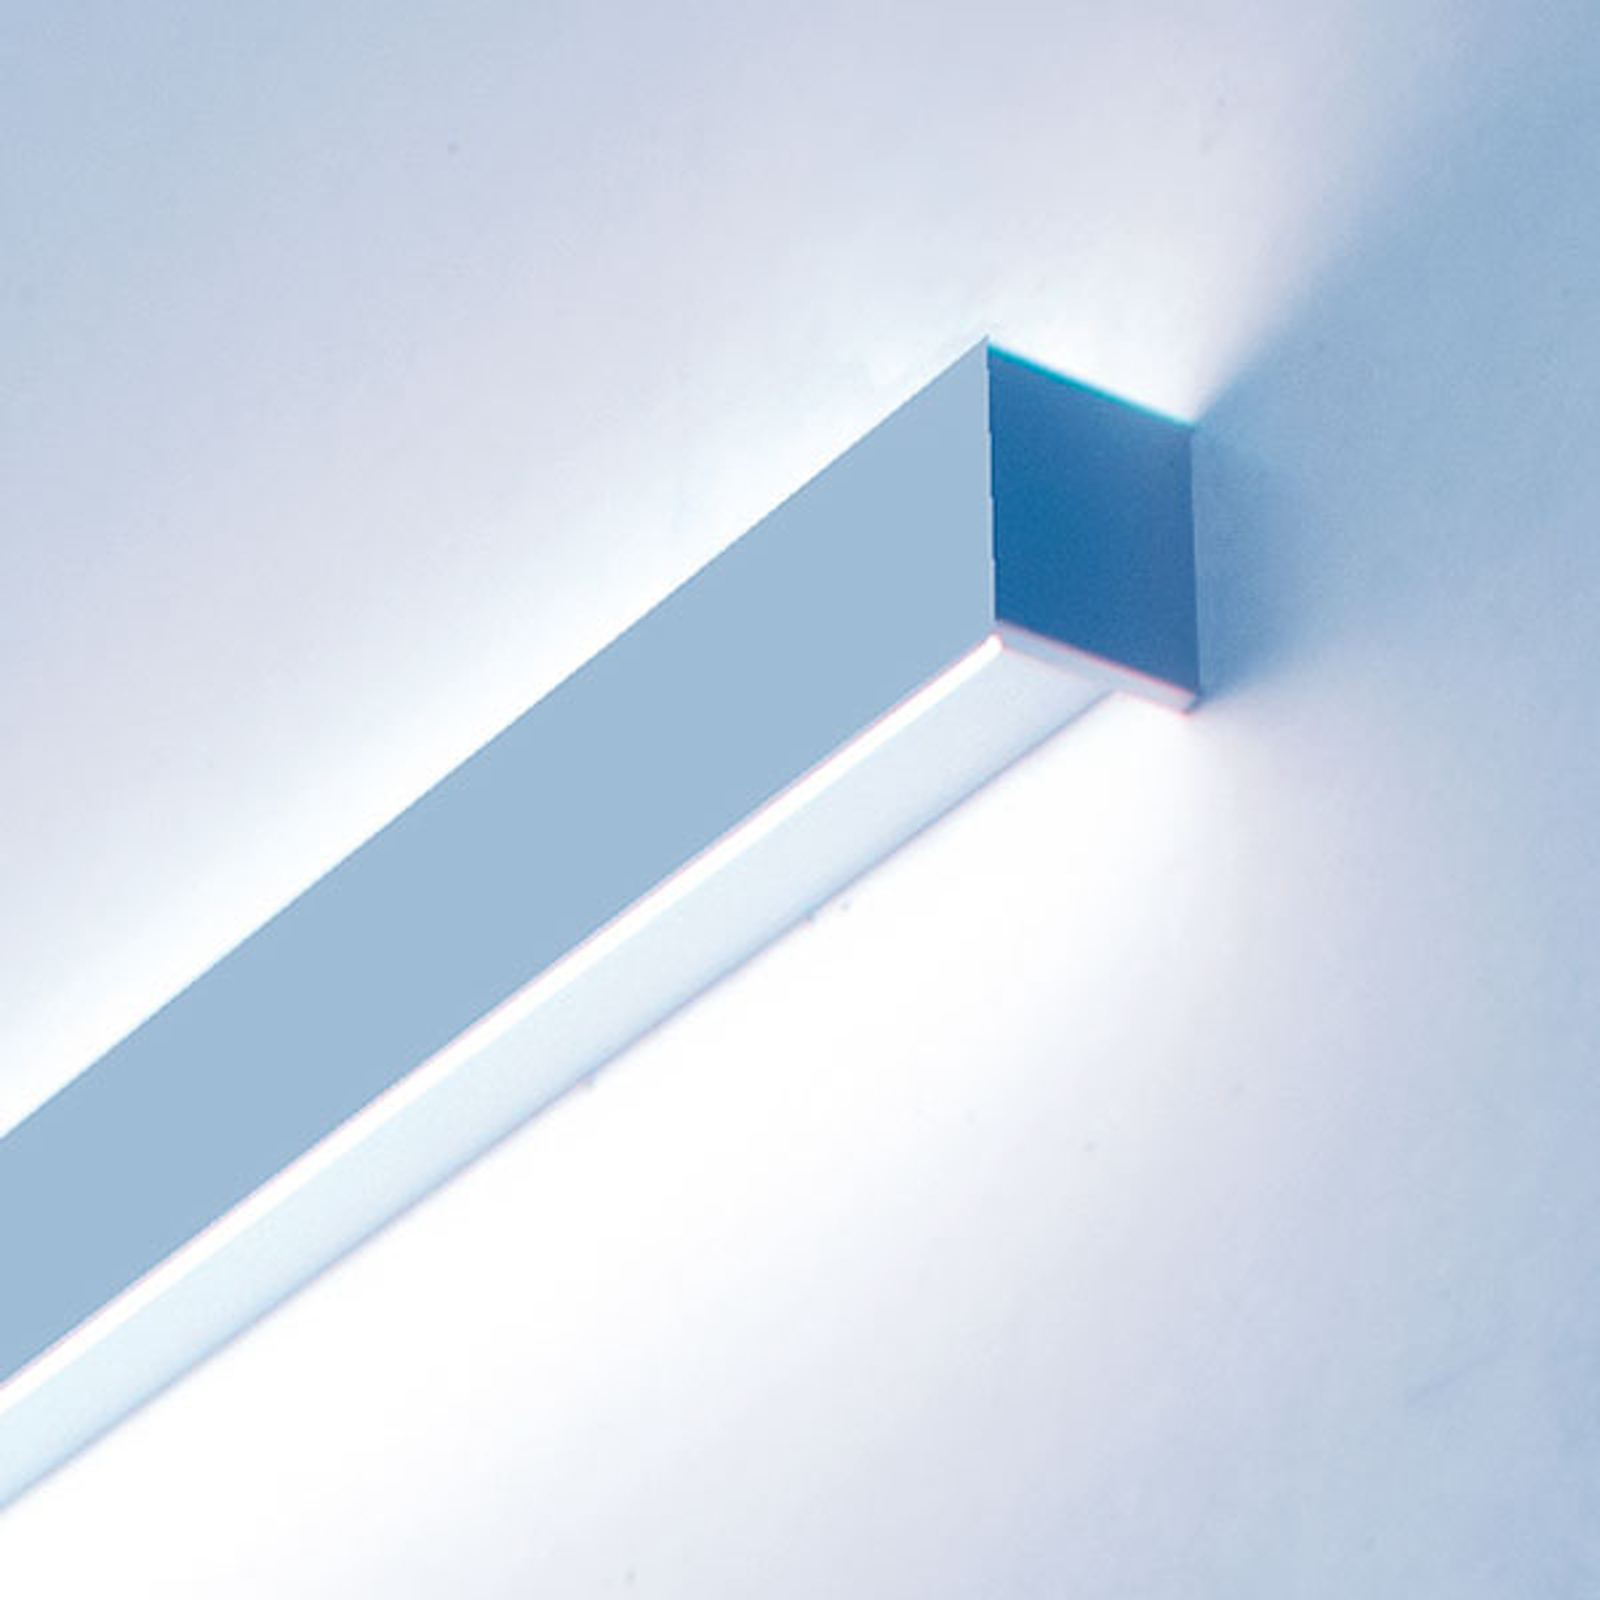 Matric W1 LED-vegglampe i 177 cm, 4000 K